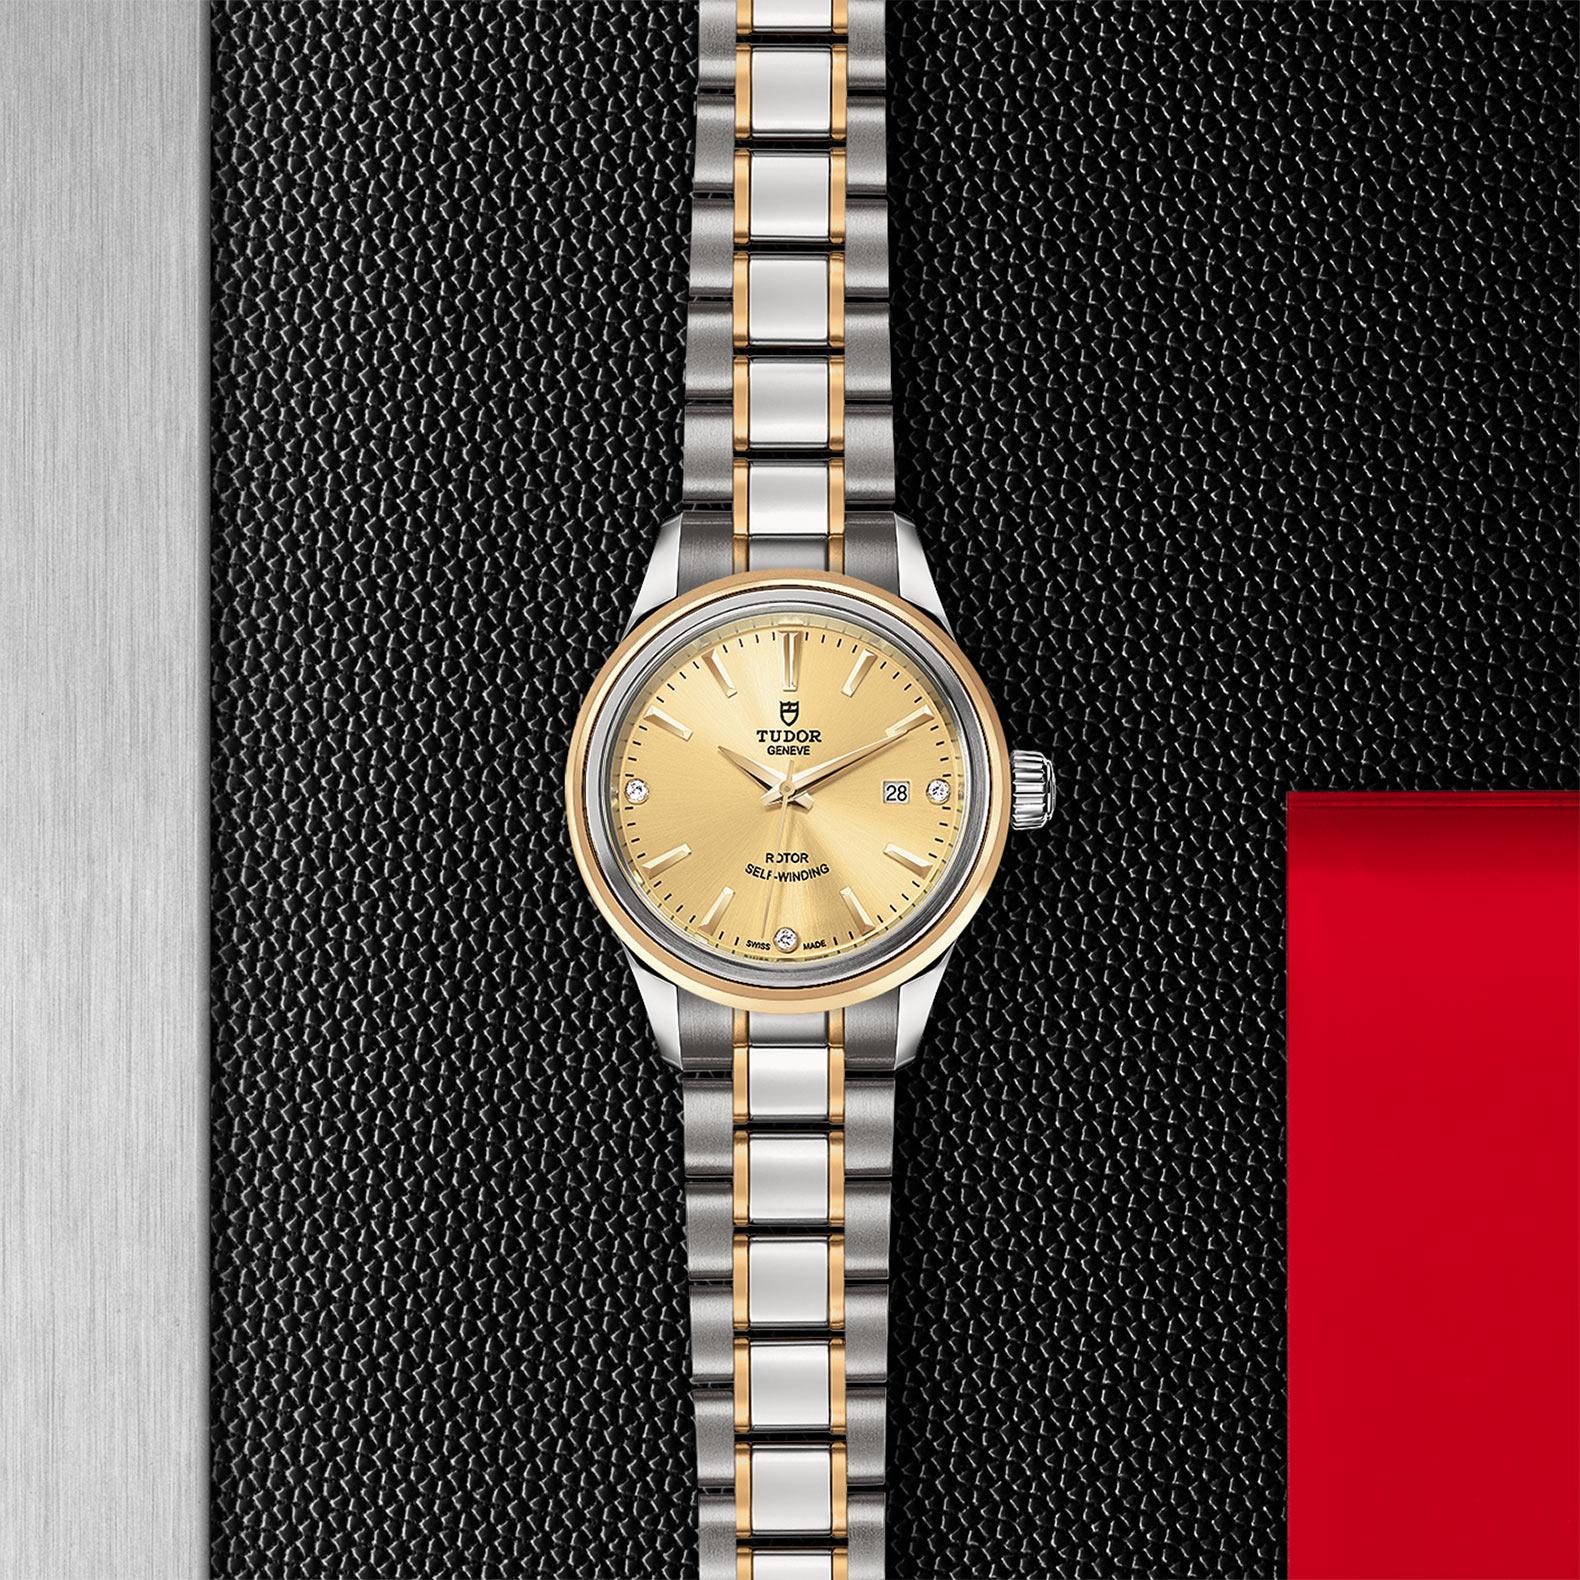 TUDOR Style - M12103-0004